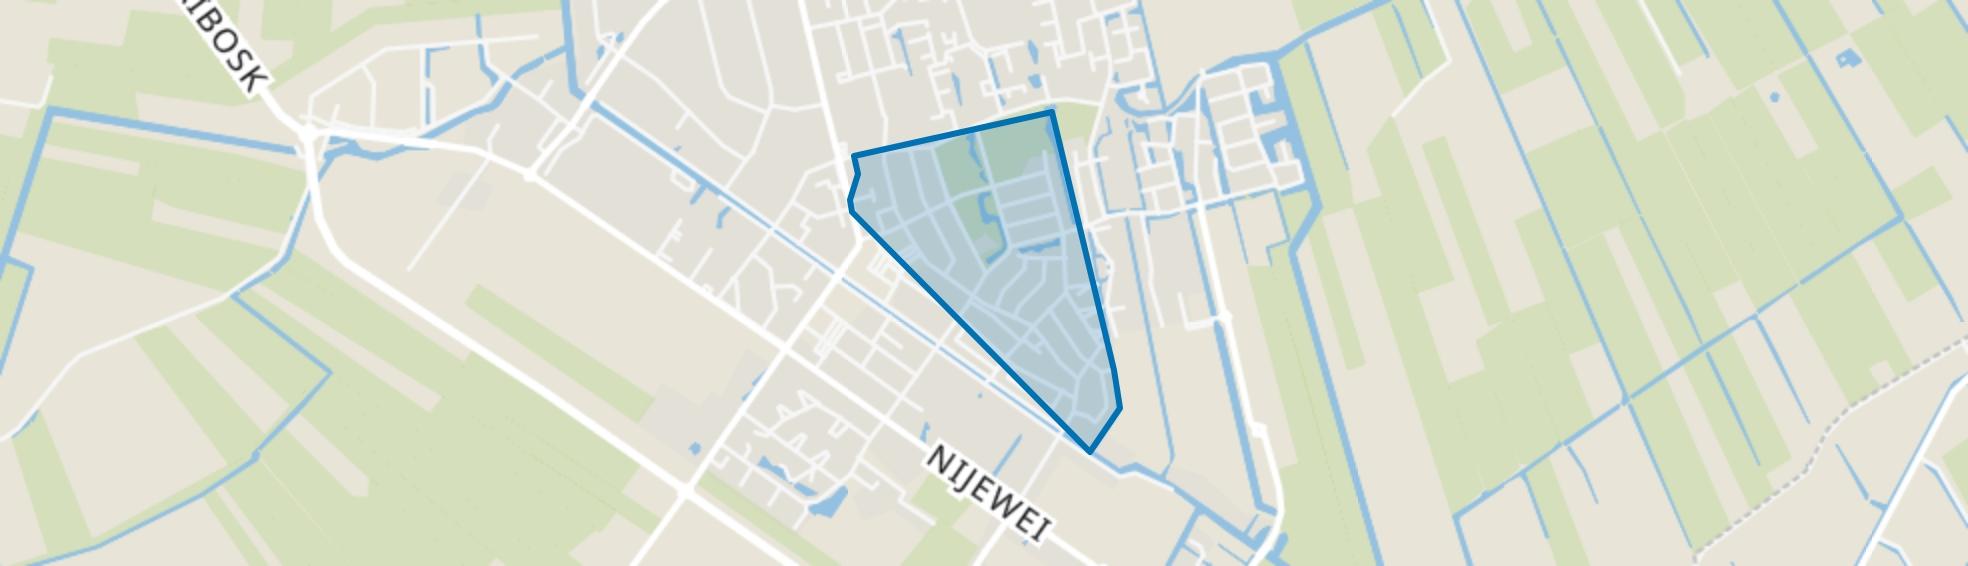 Gorredijk-Groene Long, Gorredijk map